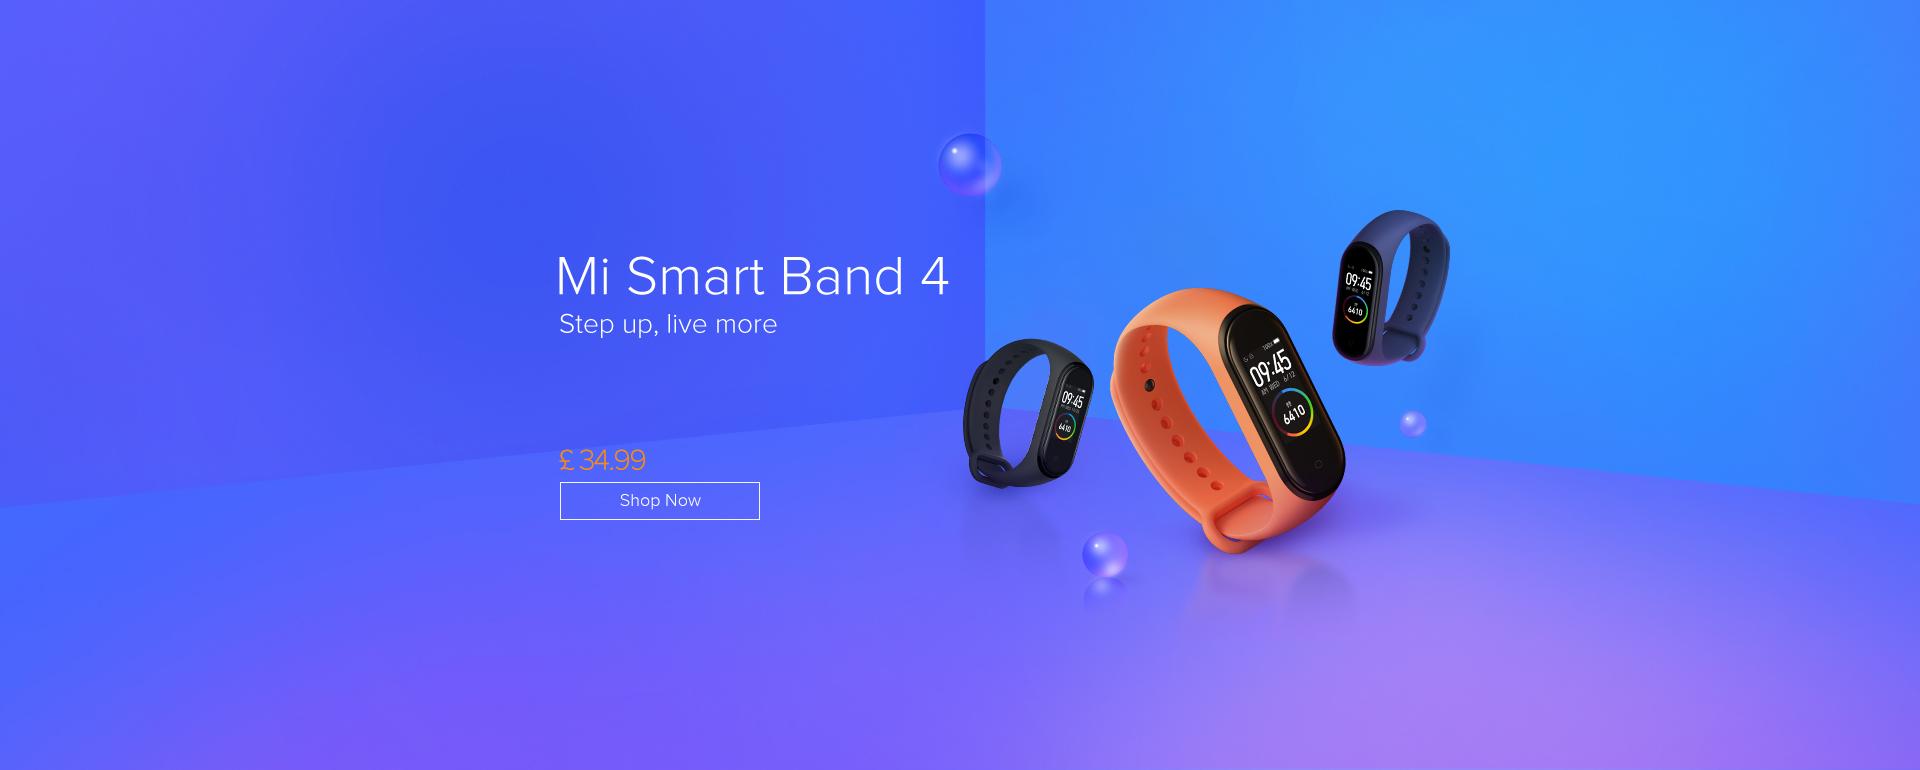 Mi Smart Band 4